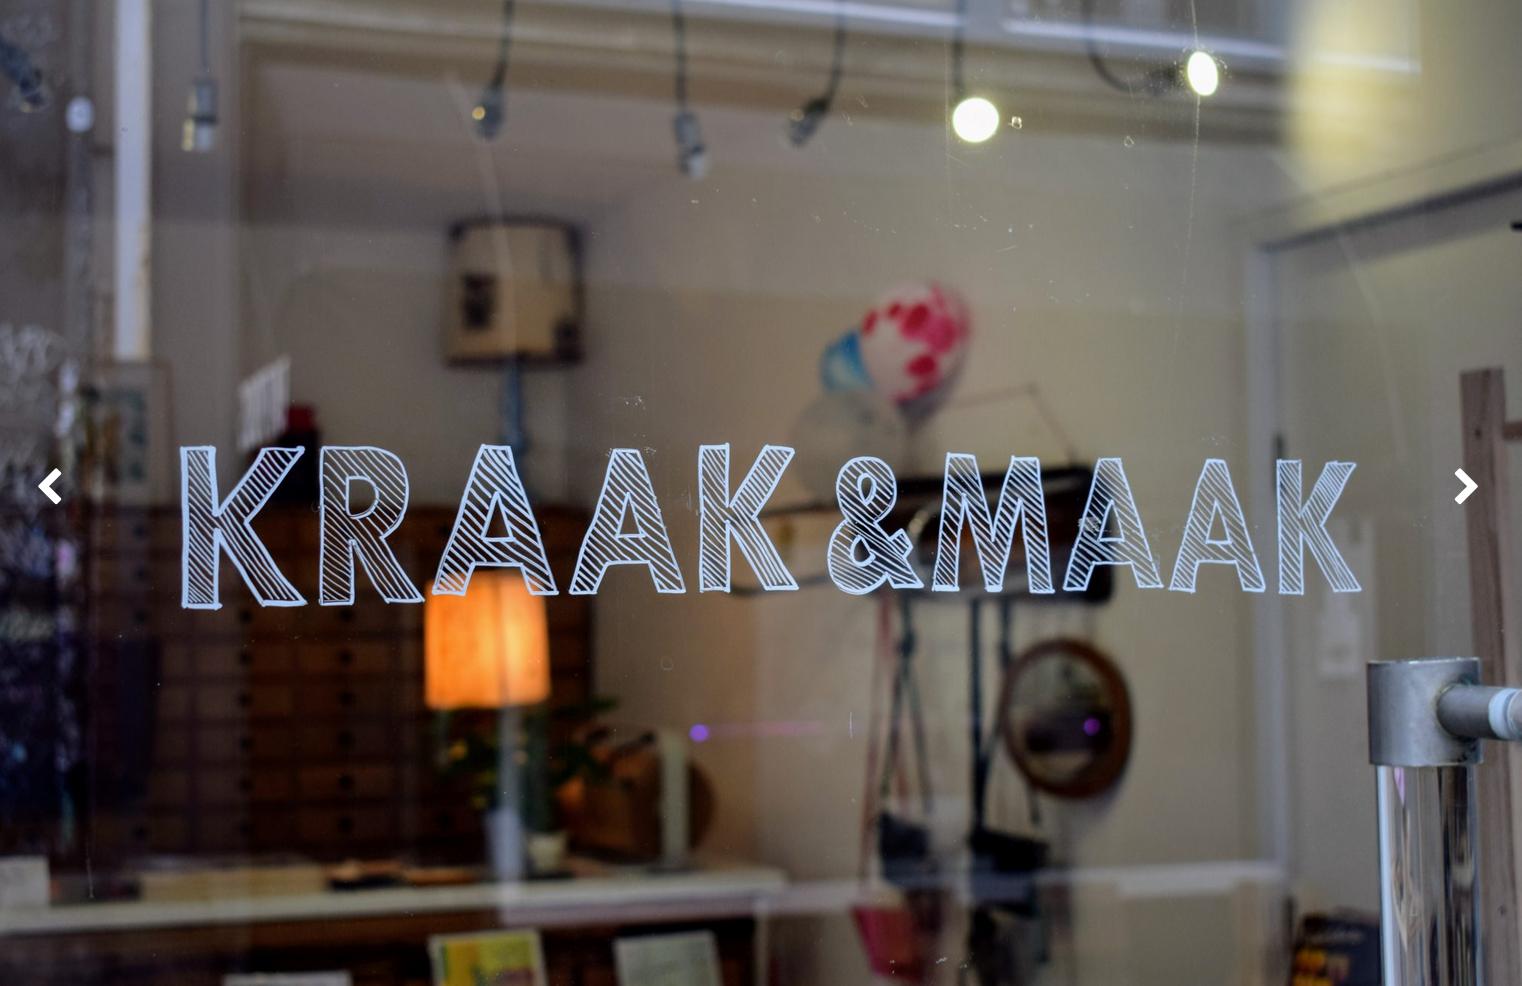 Vintage Meubels Utrecht : Vintage shoppen in utrecht deel vintage meubels little bit